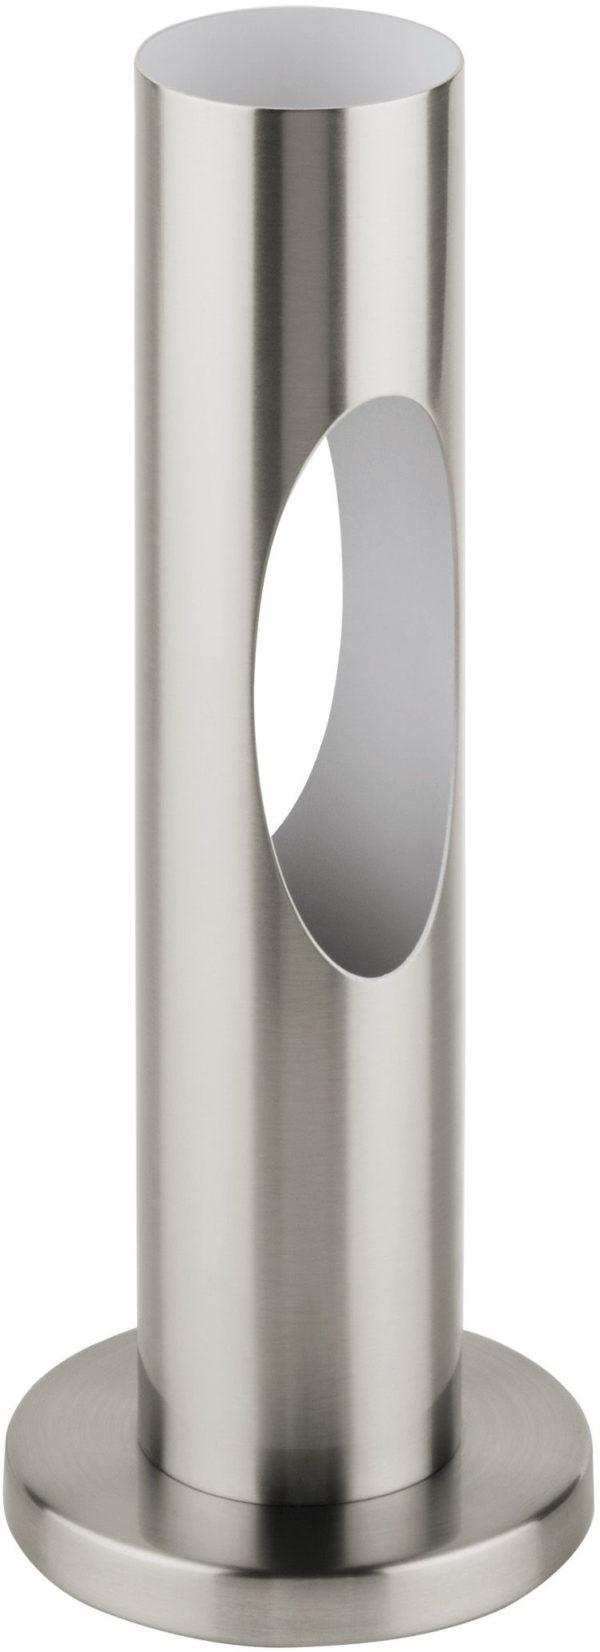 Ceratella tafellamp - nikkel-mat - wit Eglo Tafellamp 96906-EGLO